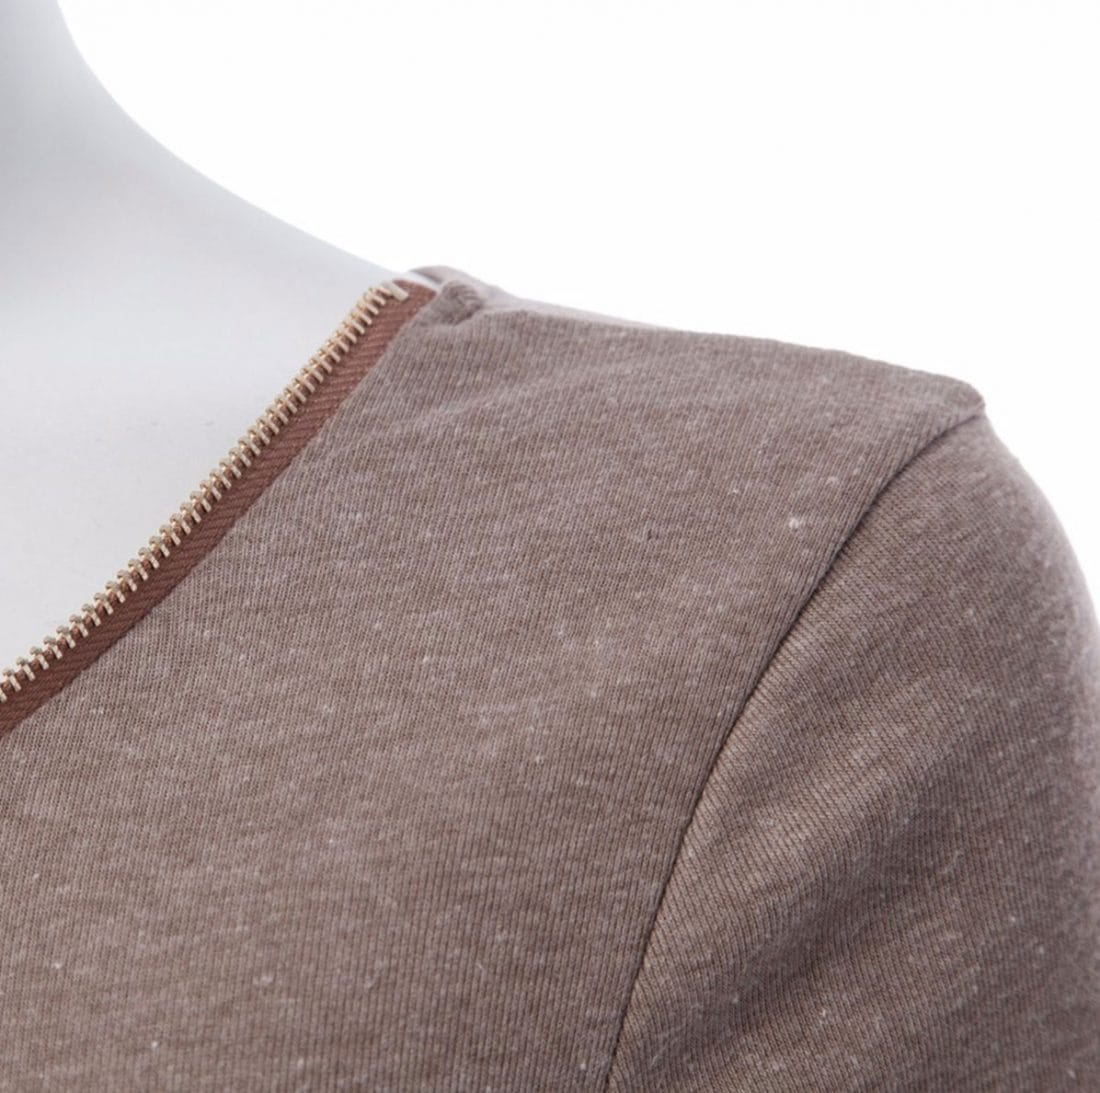 M0183 gray5 Long Sleeve Dresses maureens.com boutique